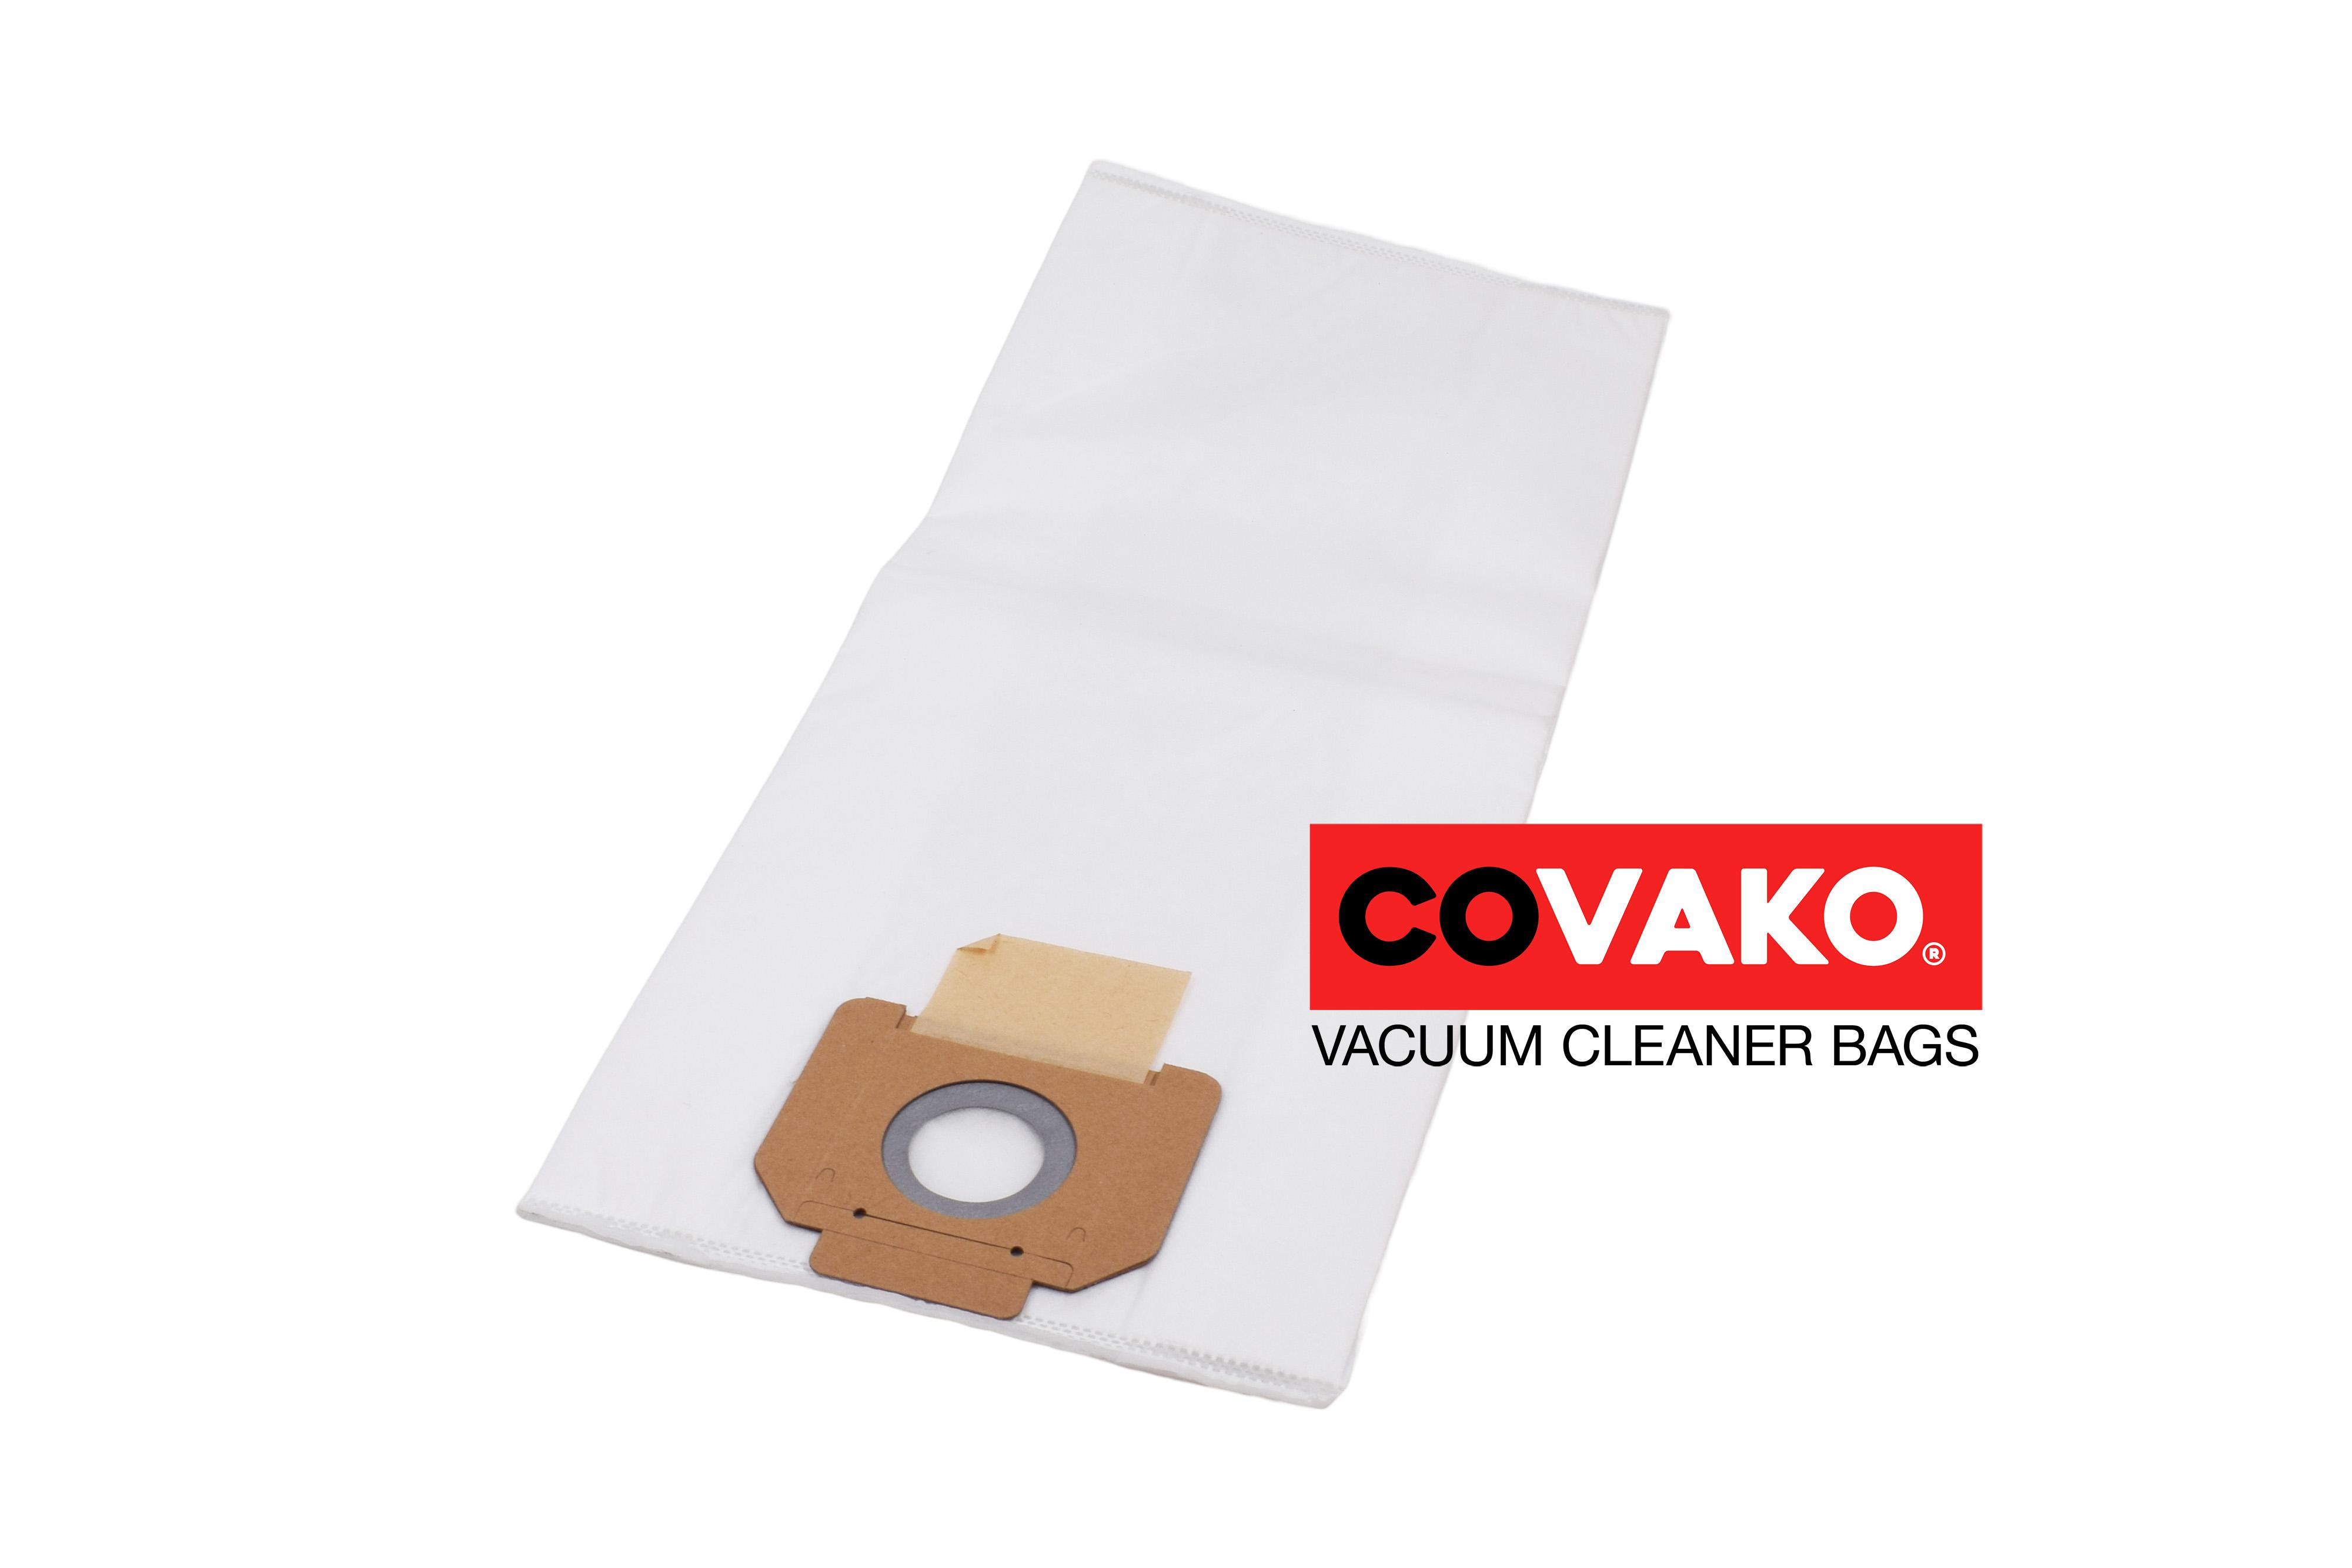 ICA GP 1/35 CYC / Synthétique - ICA sacs d'aspirateur